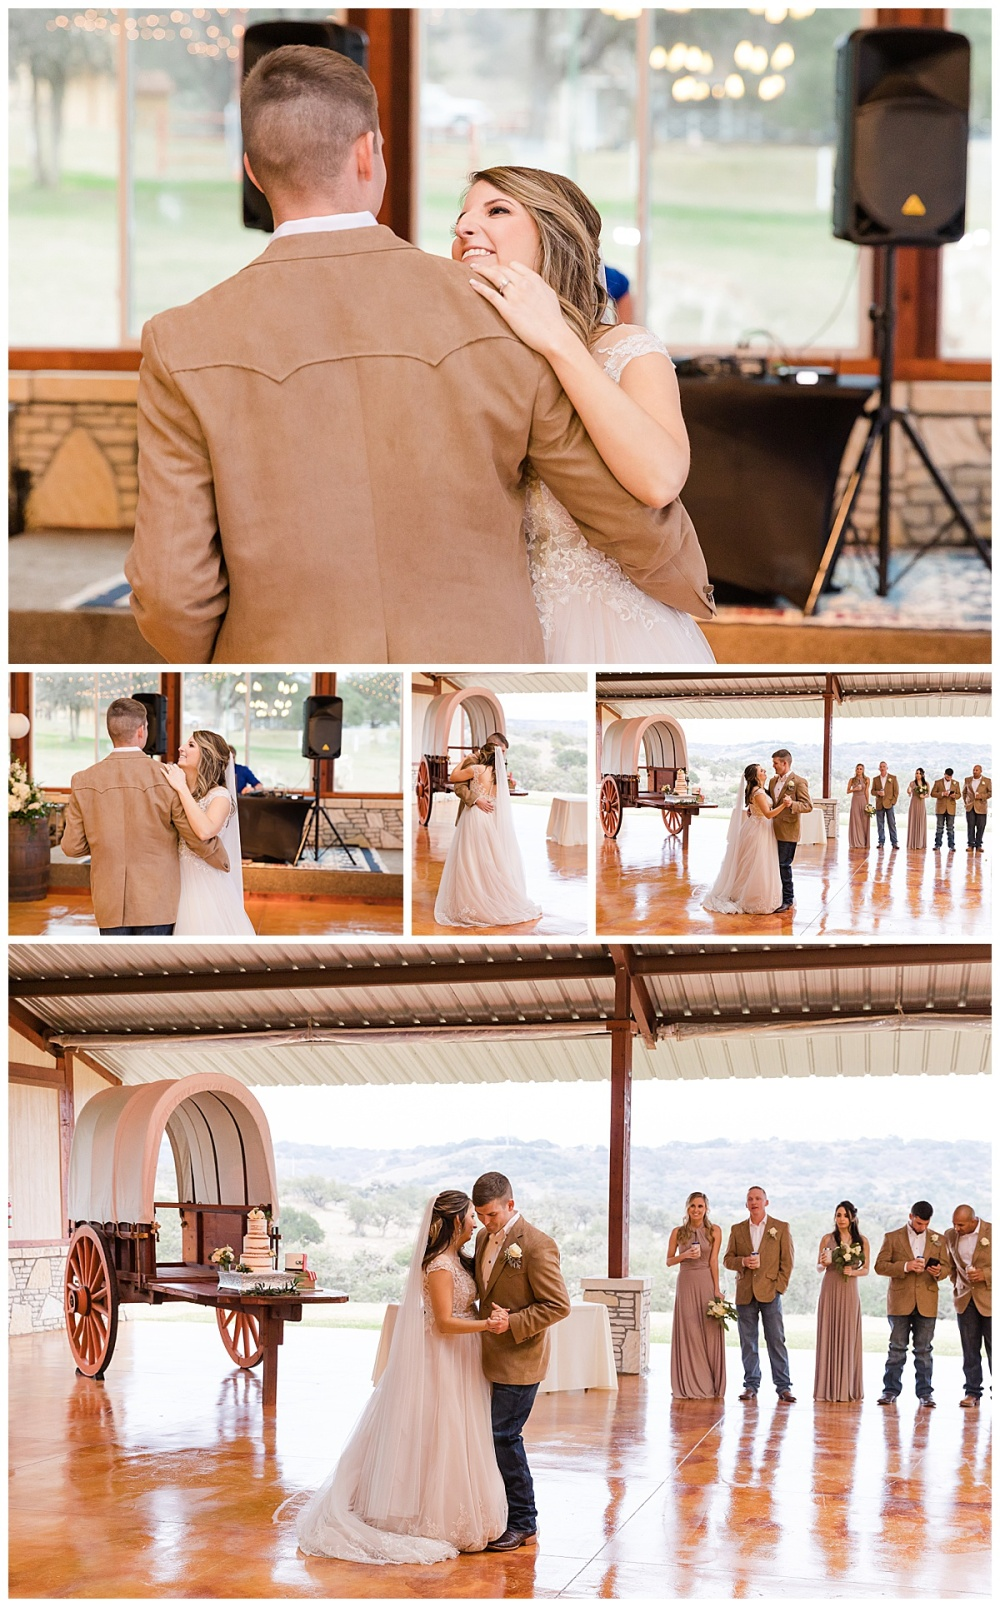 Wedding-Photographer-Texas-Hill-Country-Happy-H-Ranch-Comfor-Texas-Carly-Barton-Photography_0065.jpg